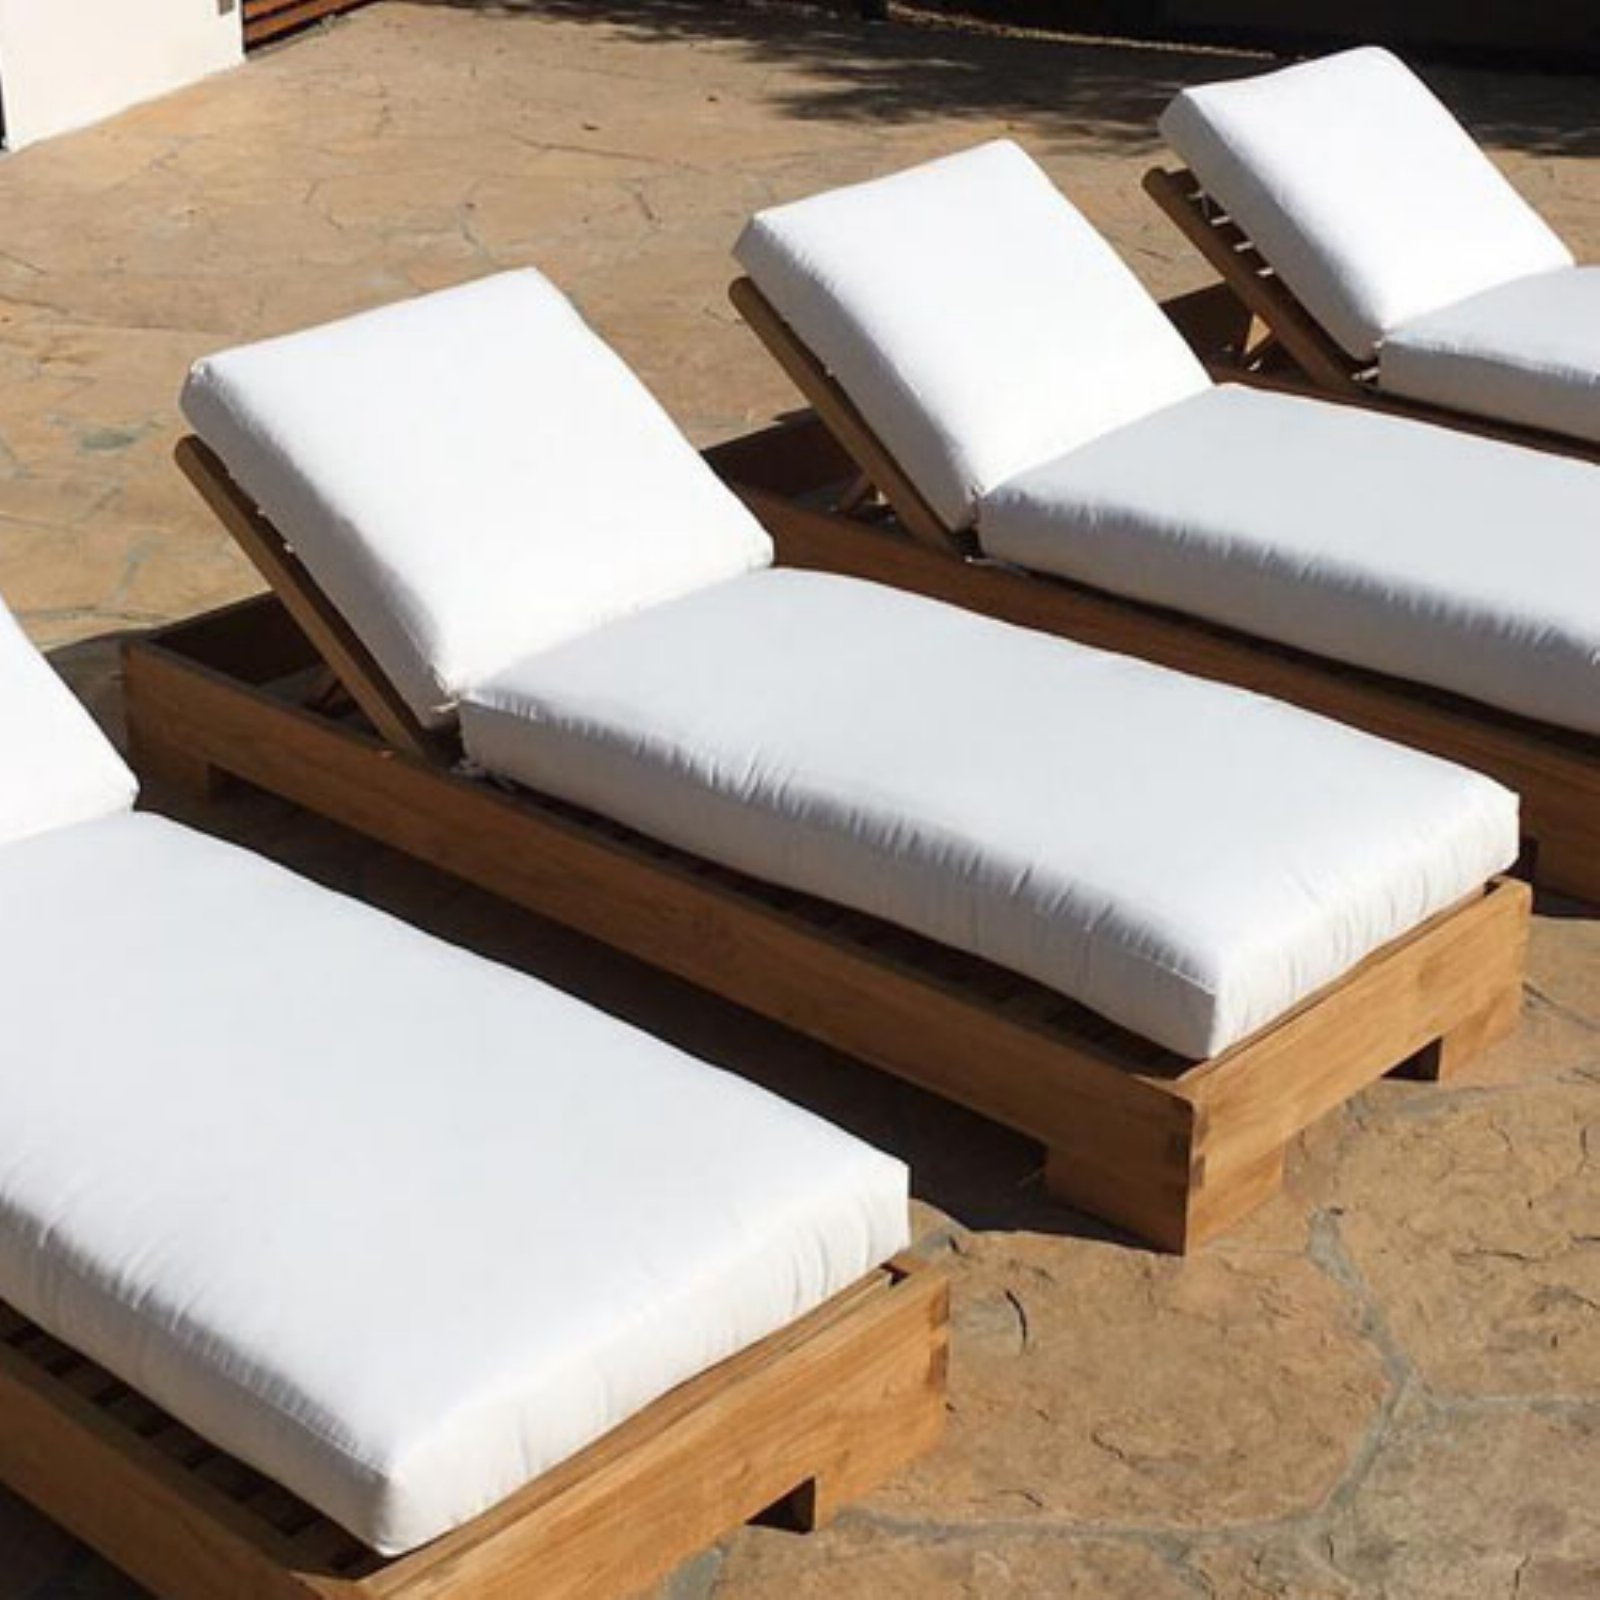 IKsun Teak Teak Outdoor Chaise Lounger with Cushion by IKSUN TEAK